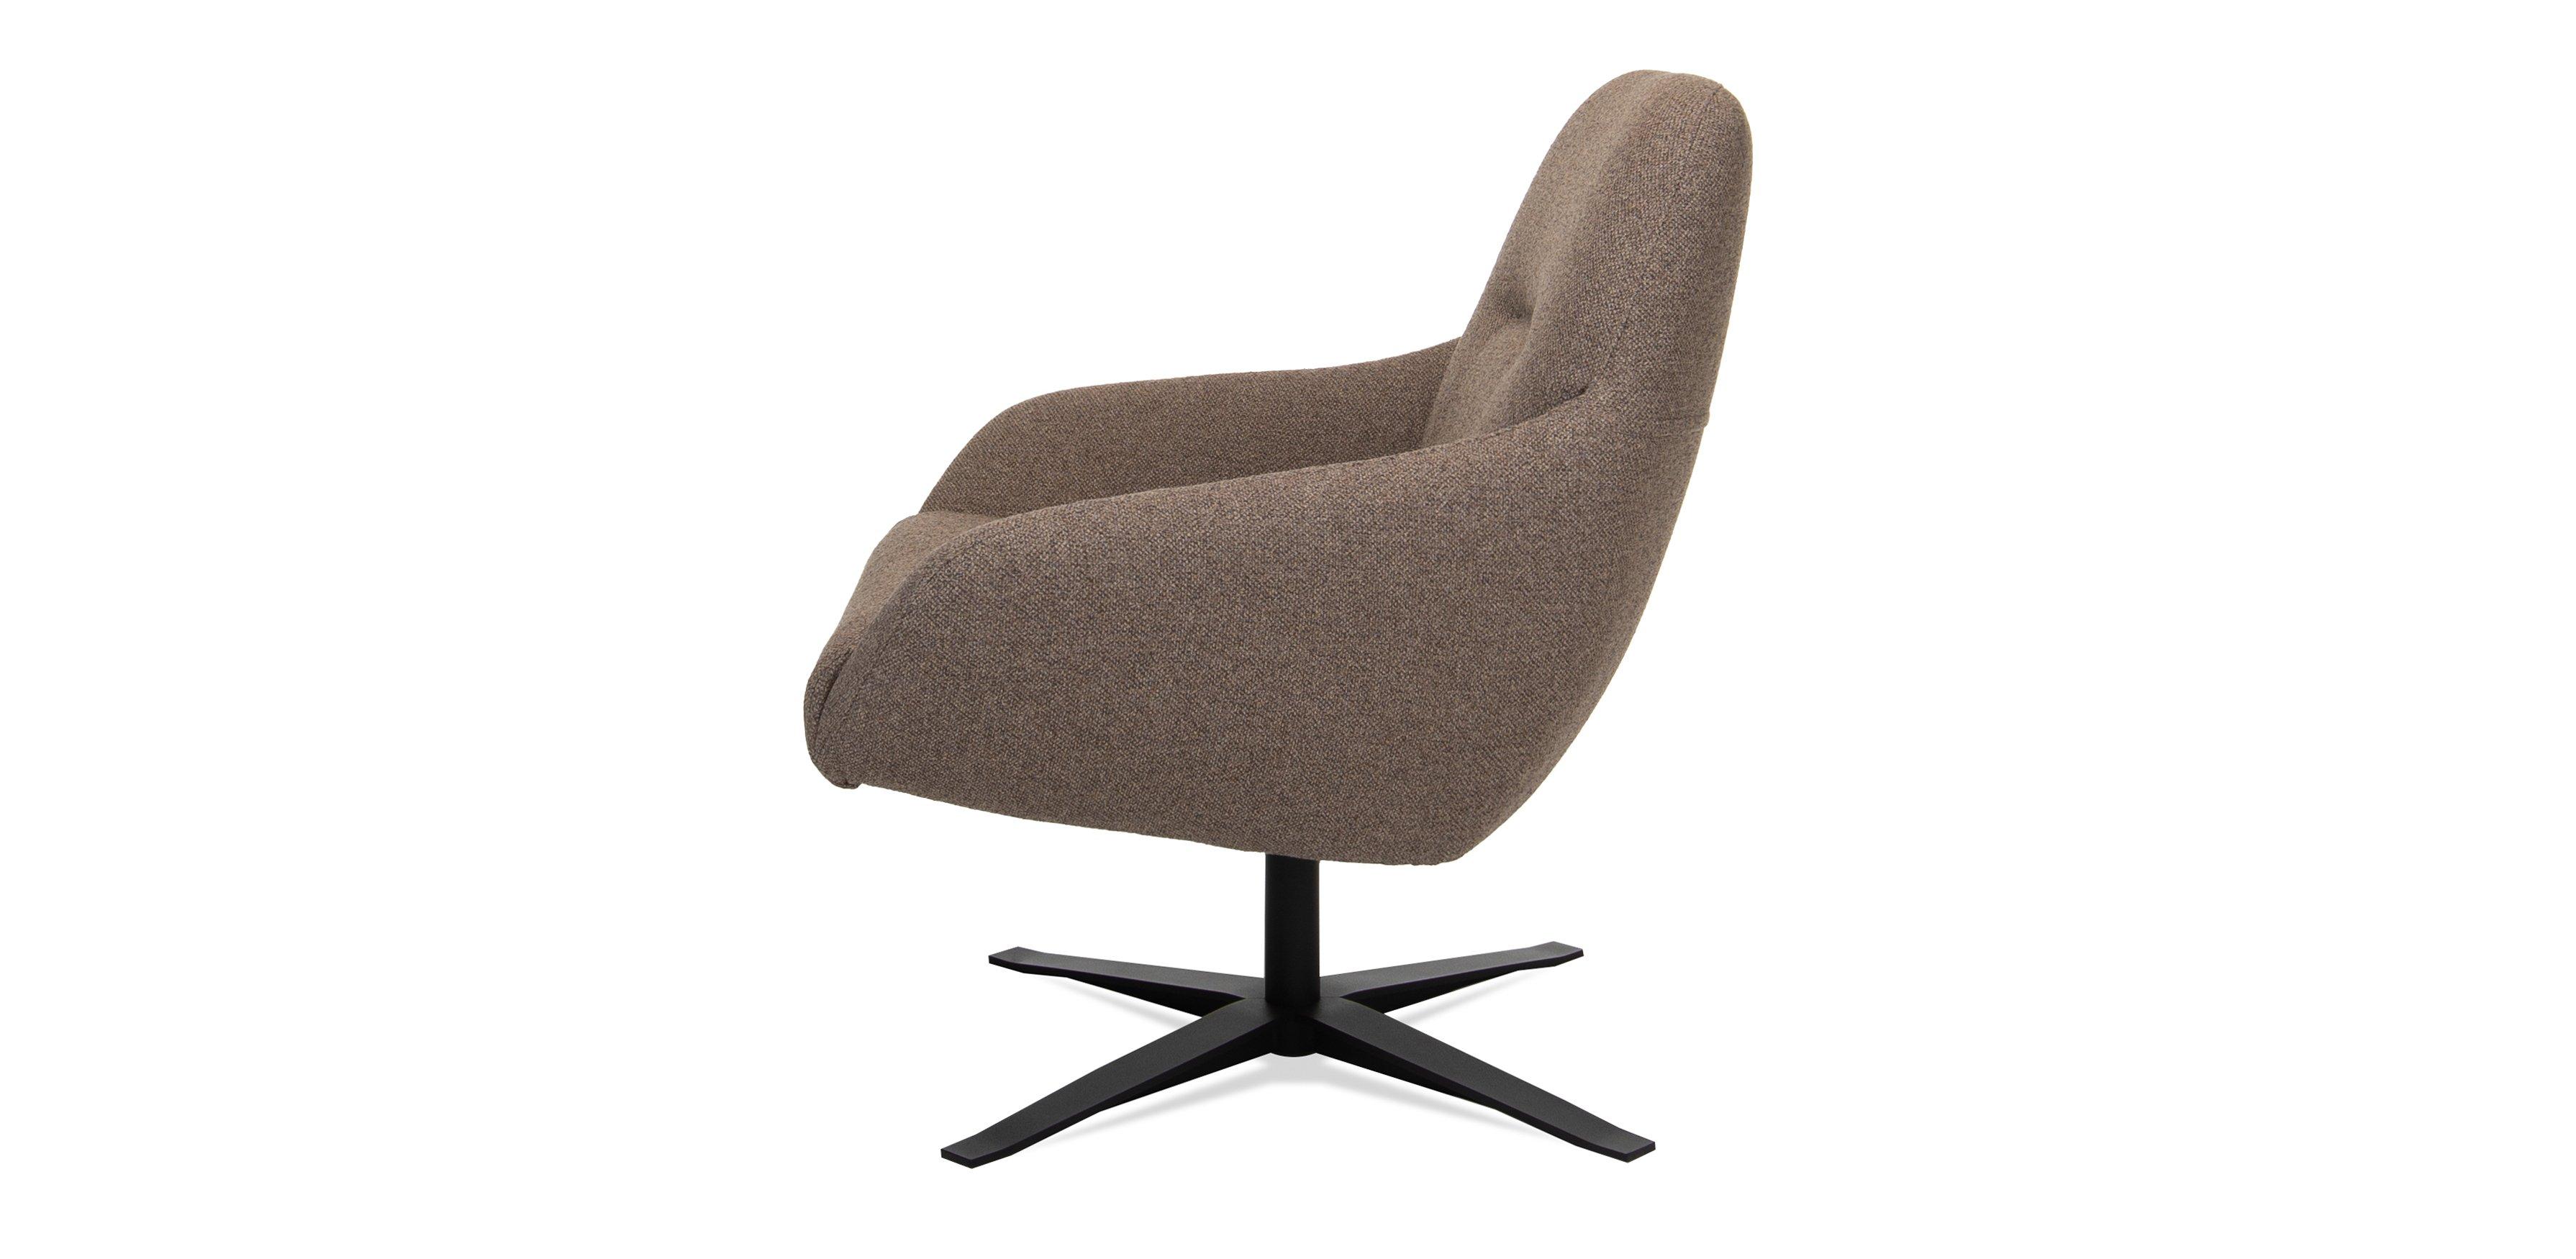 Python fauteuil DYYK 3580x1750 5